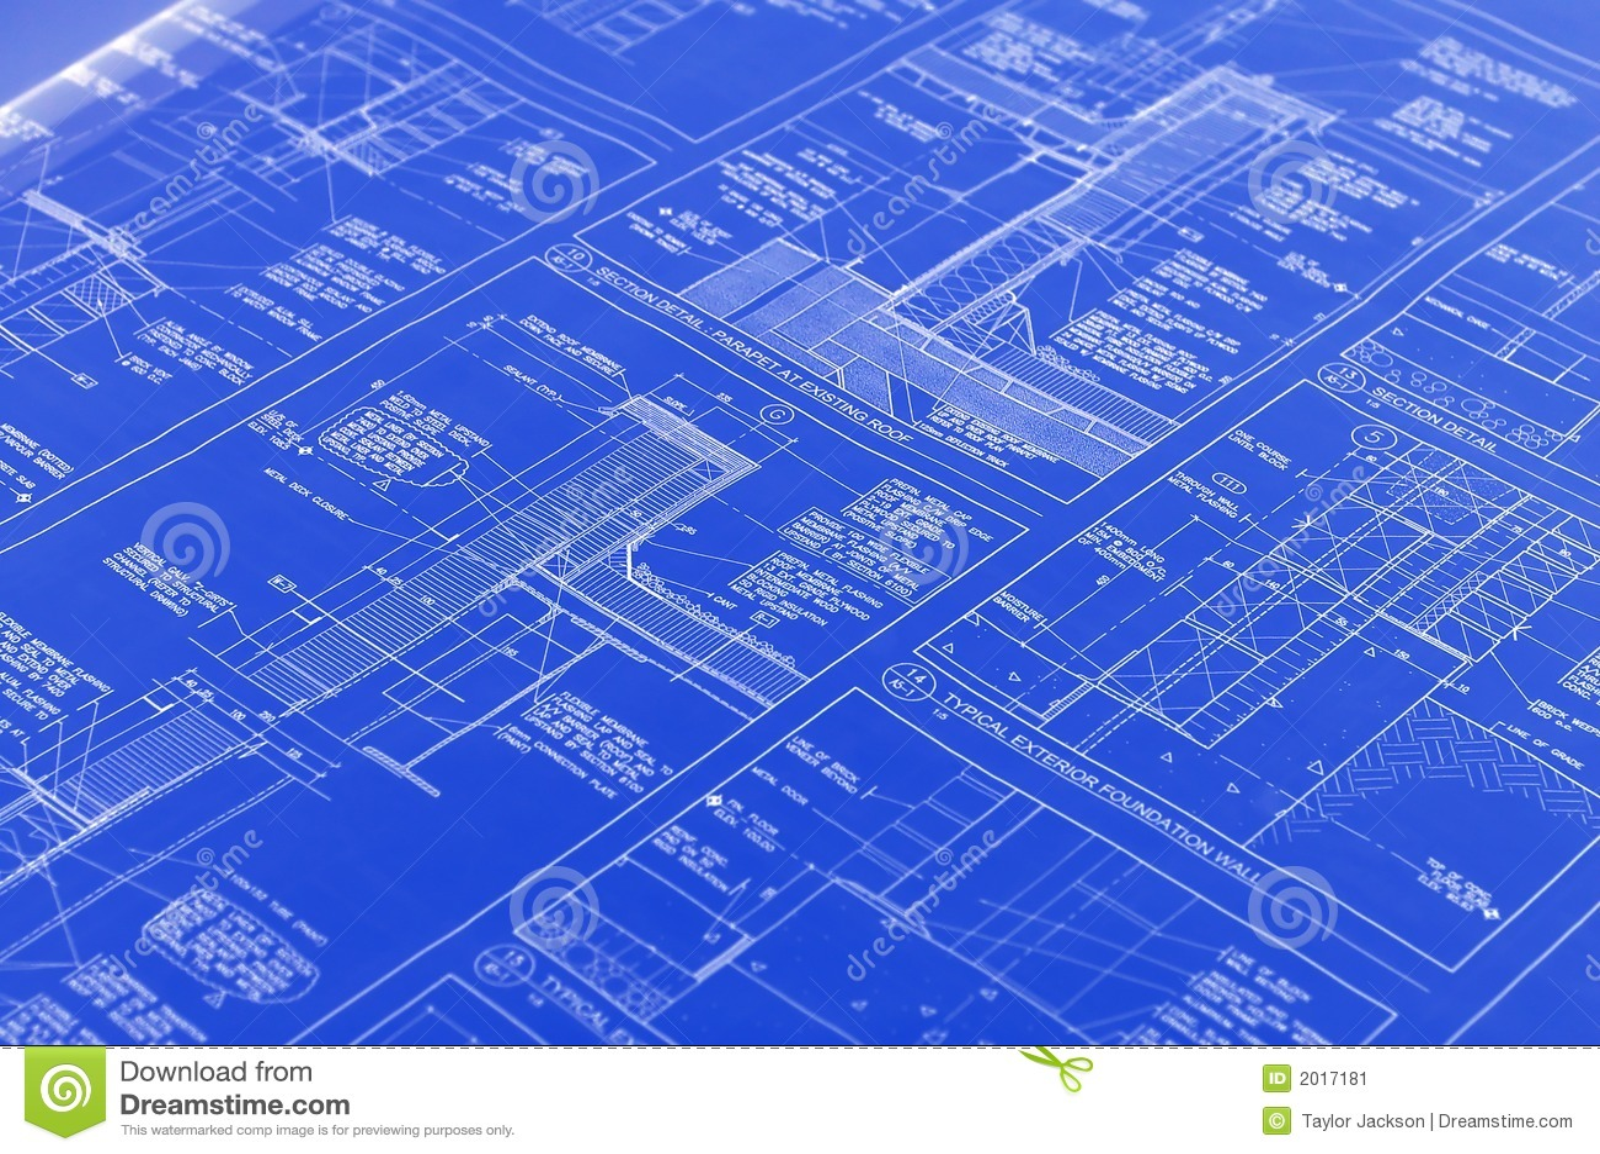 a blueprint stock image  image of dwelling  construction